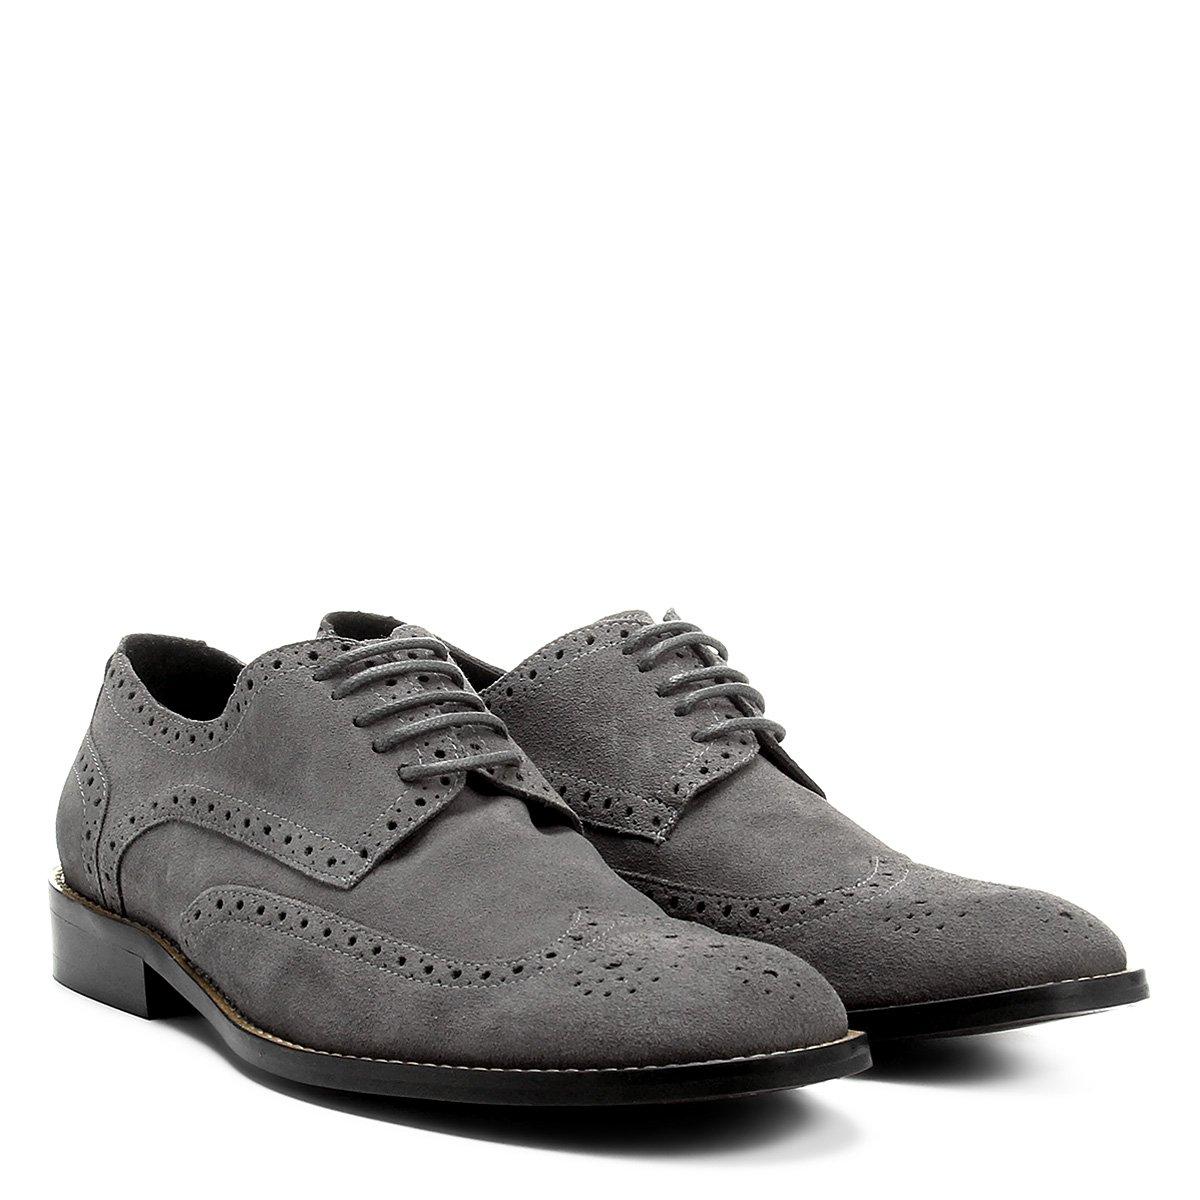 d0d6b4782 Oxford Couro Shoestock Brogue Masculino